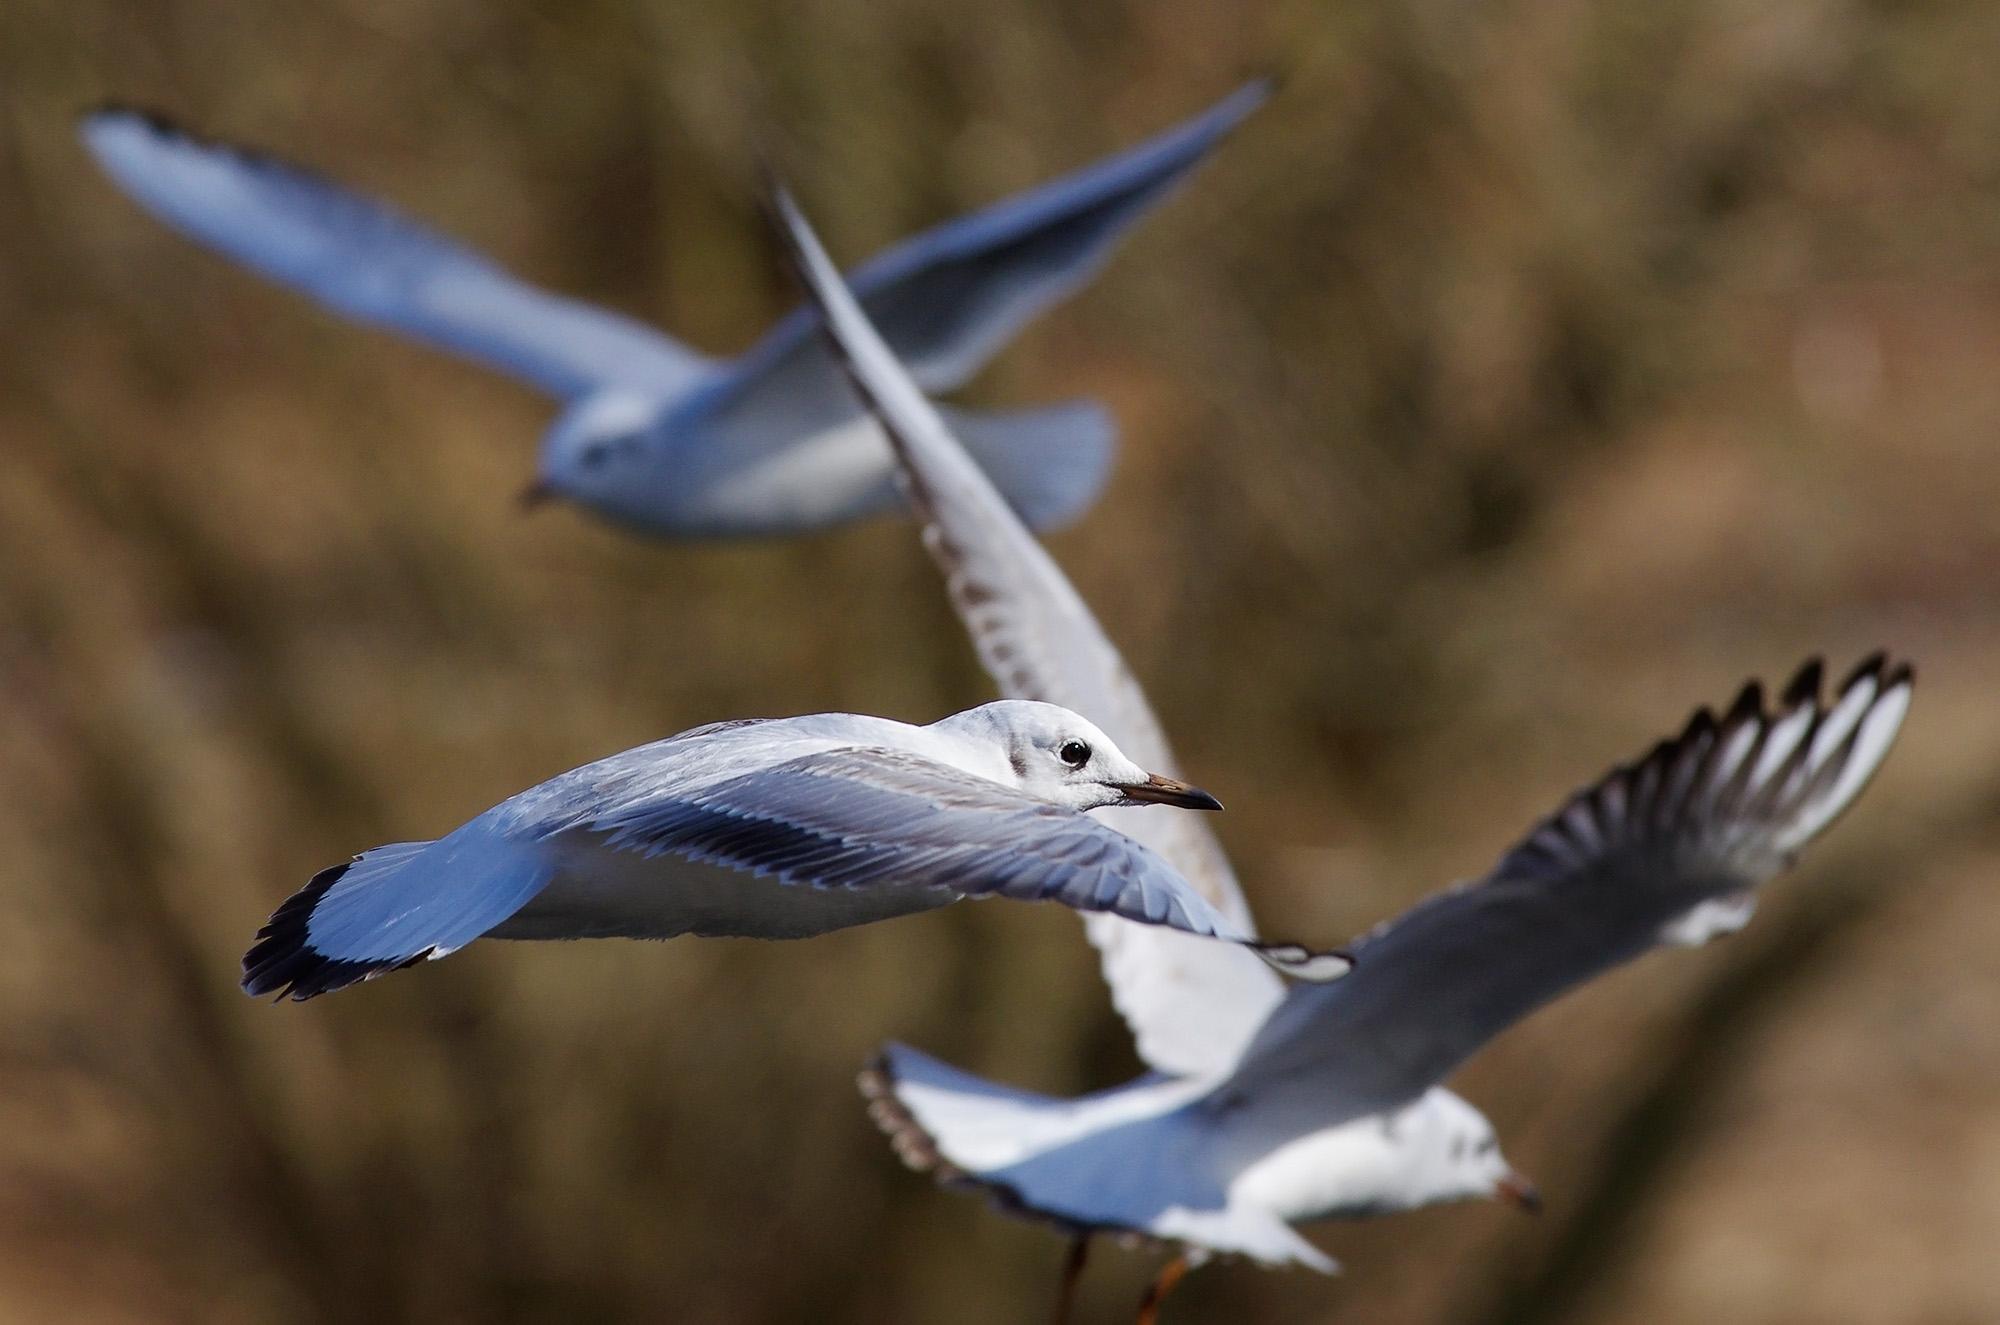 Pentax DA 300 mm f/4 ED (IF) SDM test flying birds photo Christian Nilsson